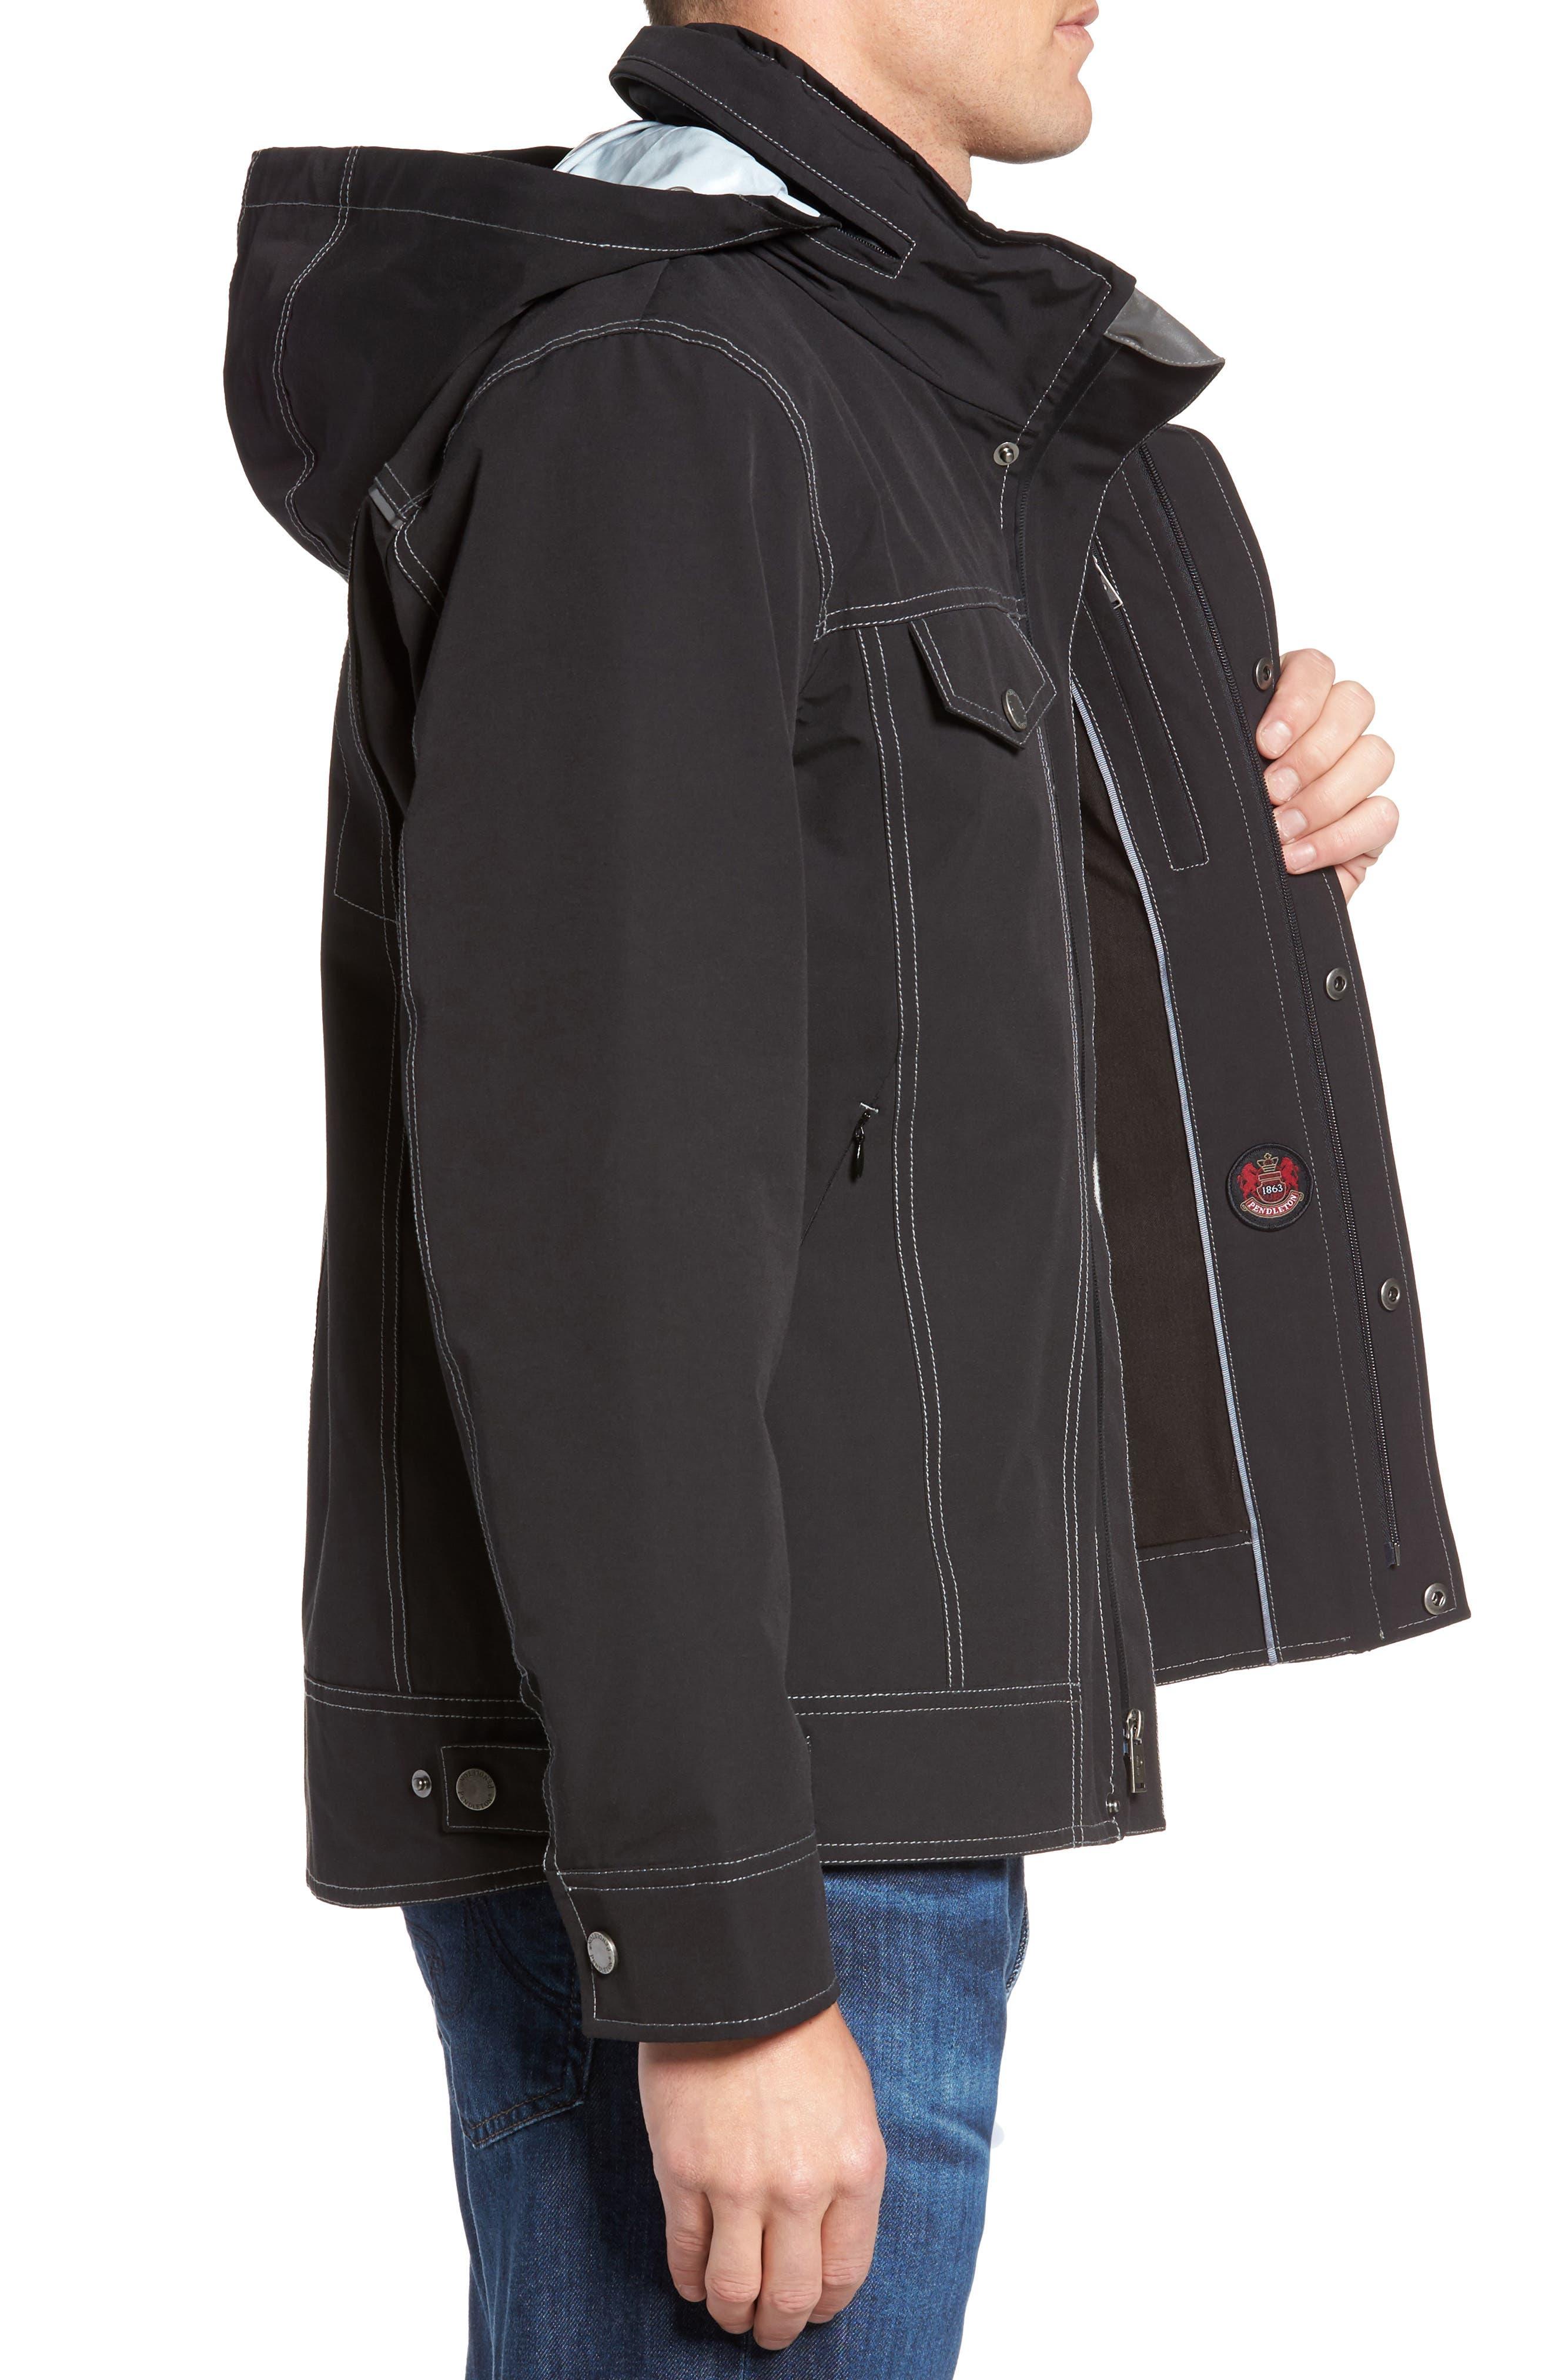 Forks Waterproof Jacket,                             Alternate thumbnail 3, color,                             001